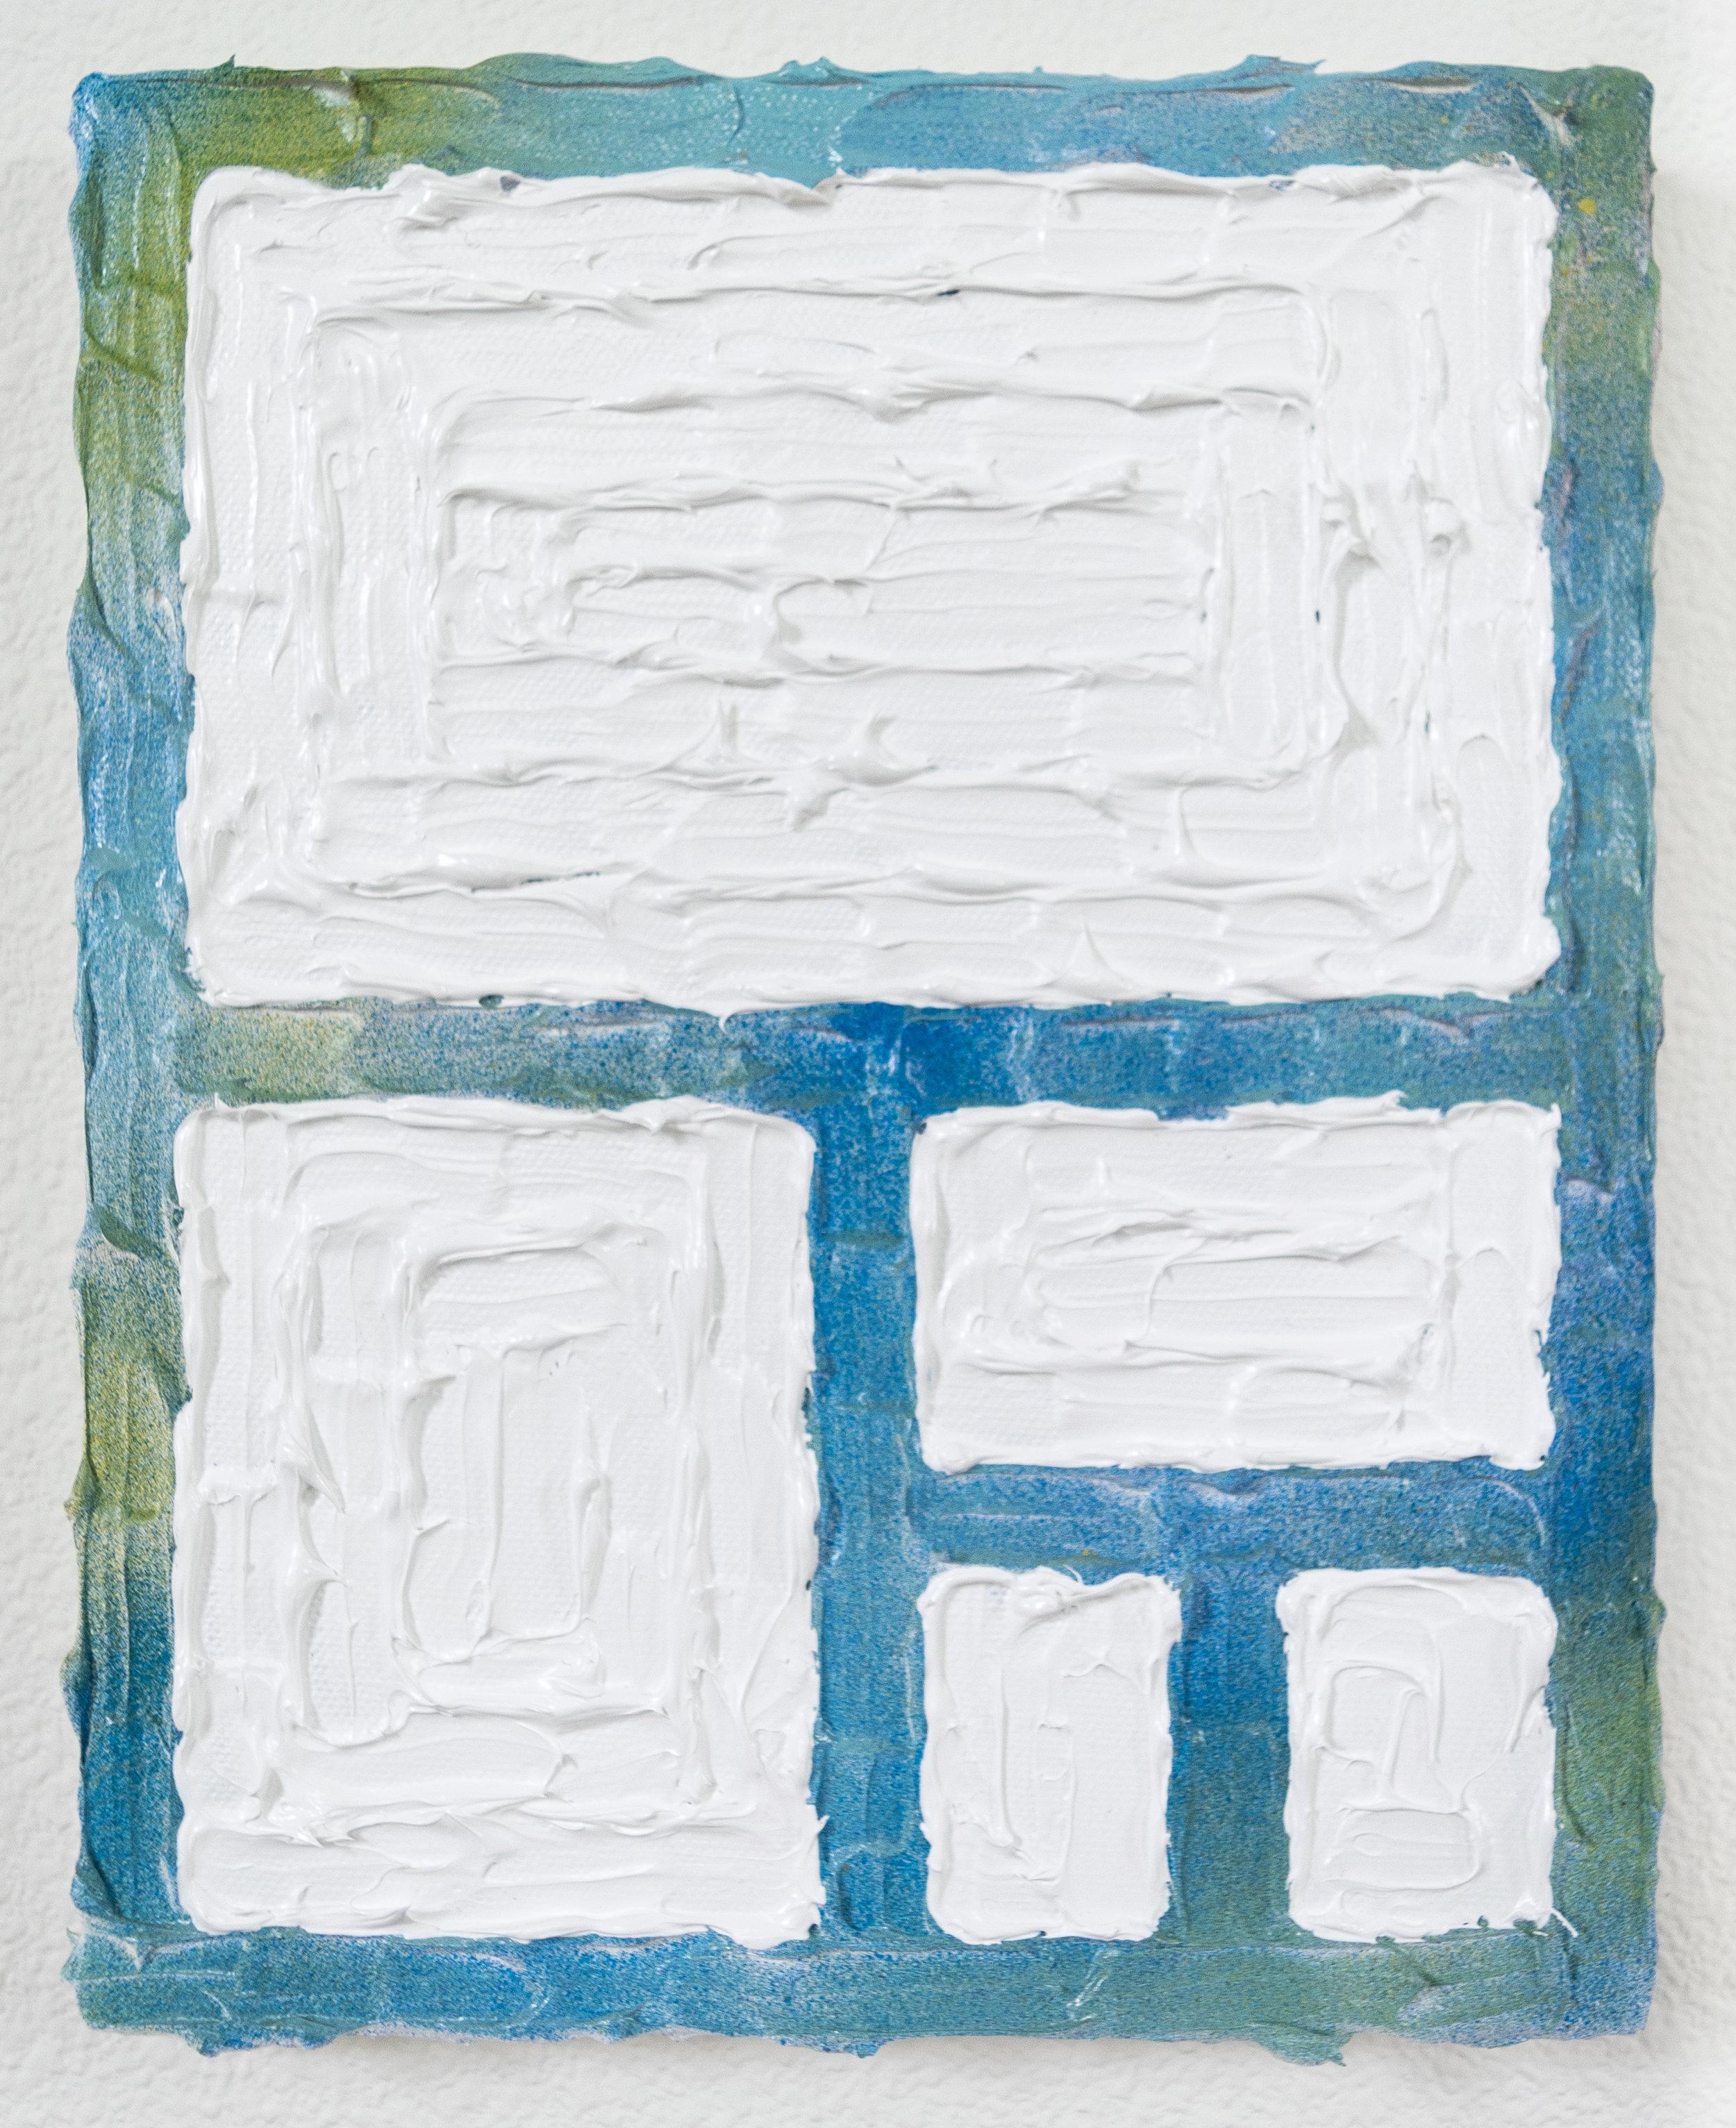 Future Houseplan  Acrylic, enamel, canvas  8 x 10 inches  2017